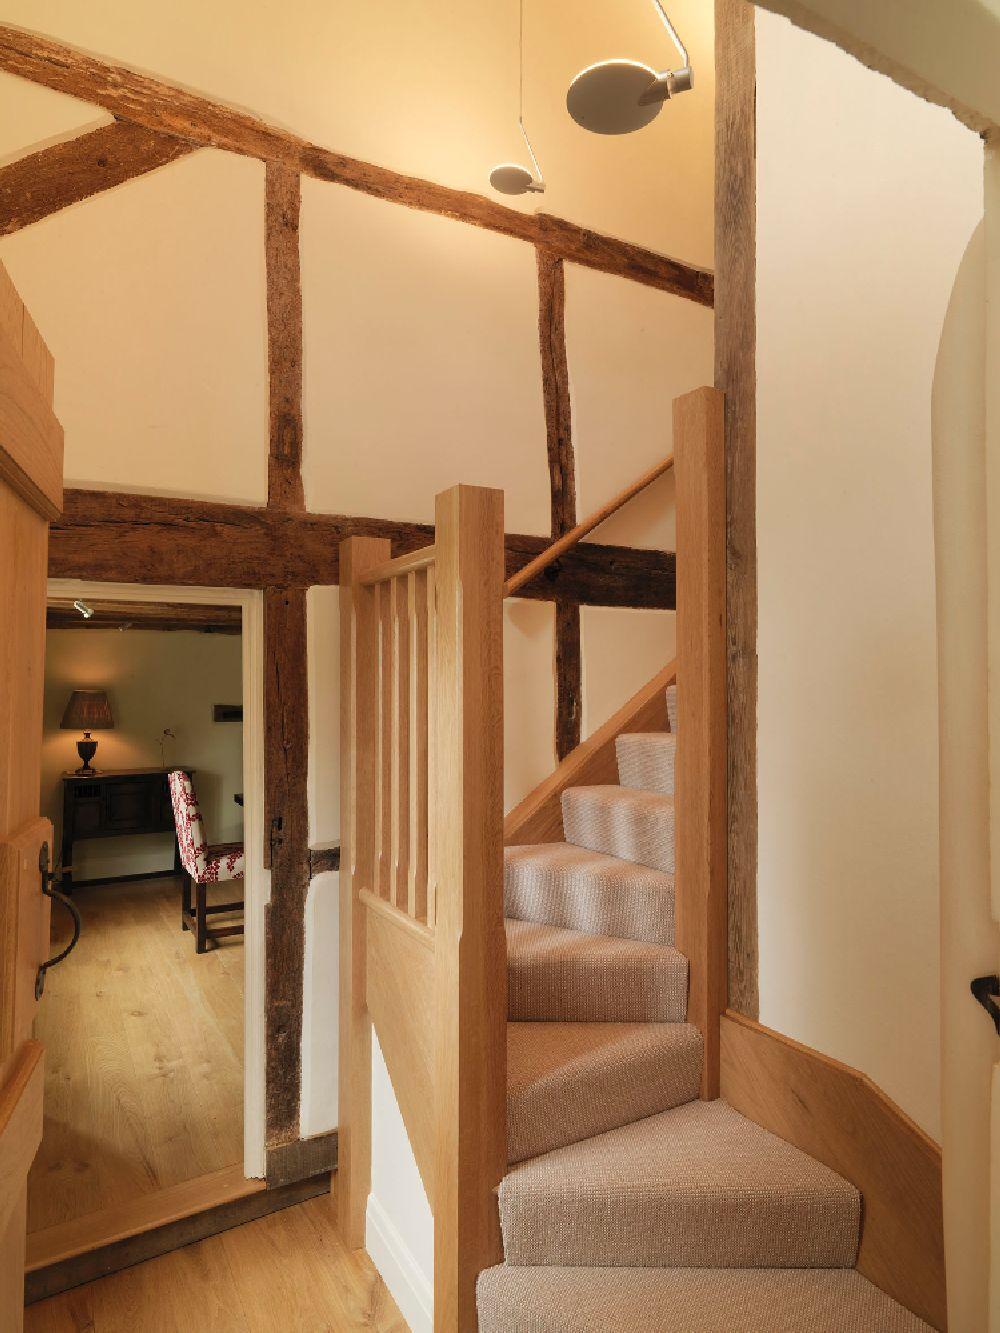 adelaparvu.com despre casa cu acoperis de stuf, casa veche sec XVII Anglia modernizata, design interior Icon Interios, Foto Steve Russell Studios (8)